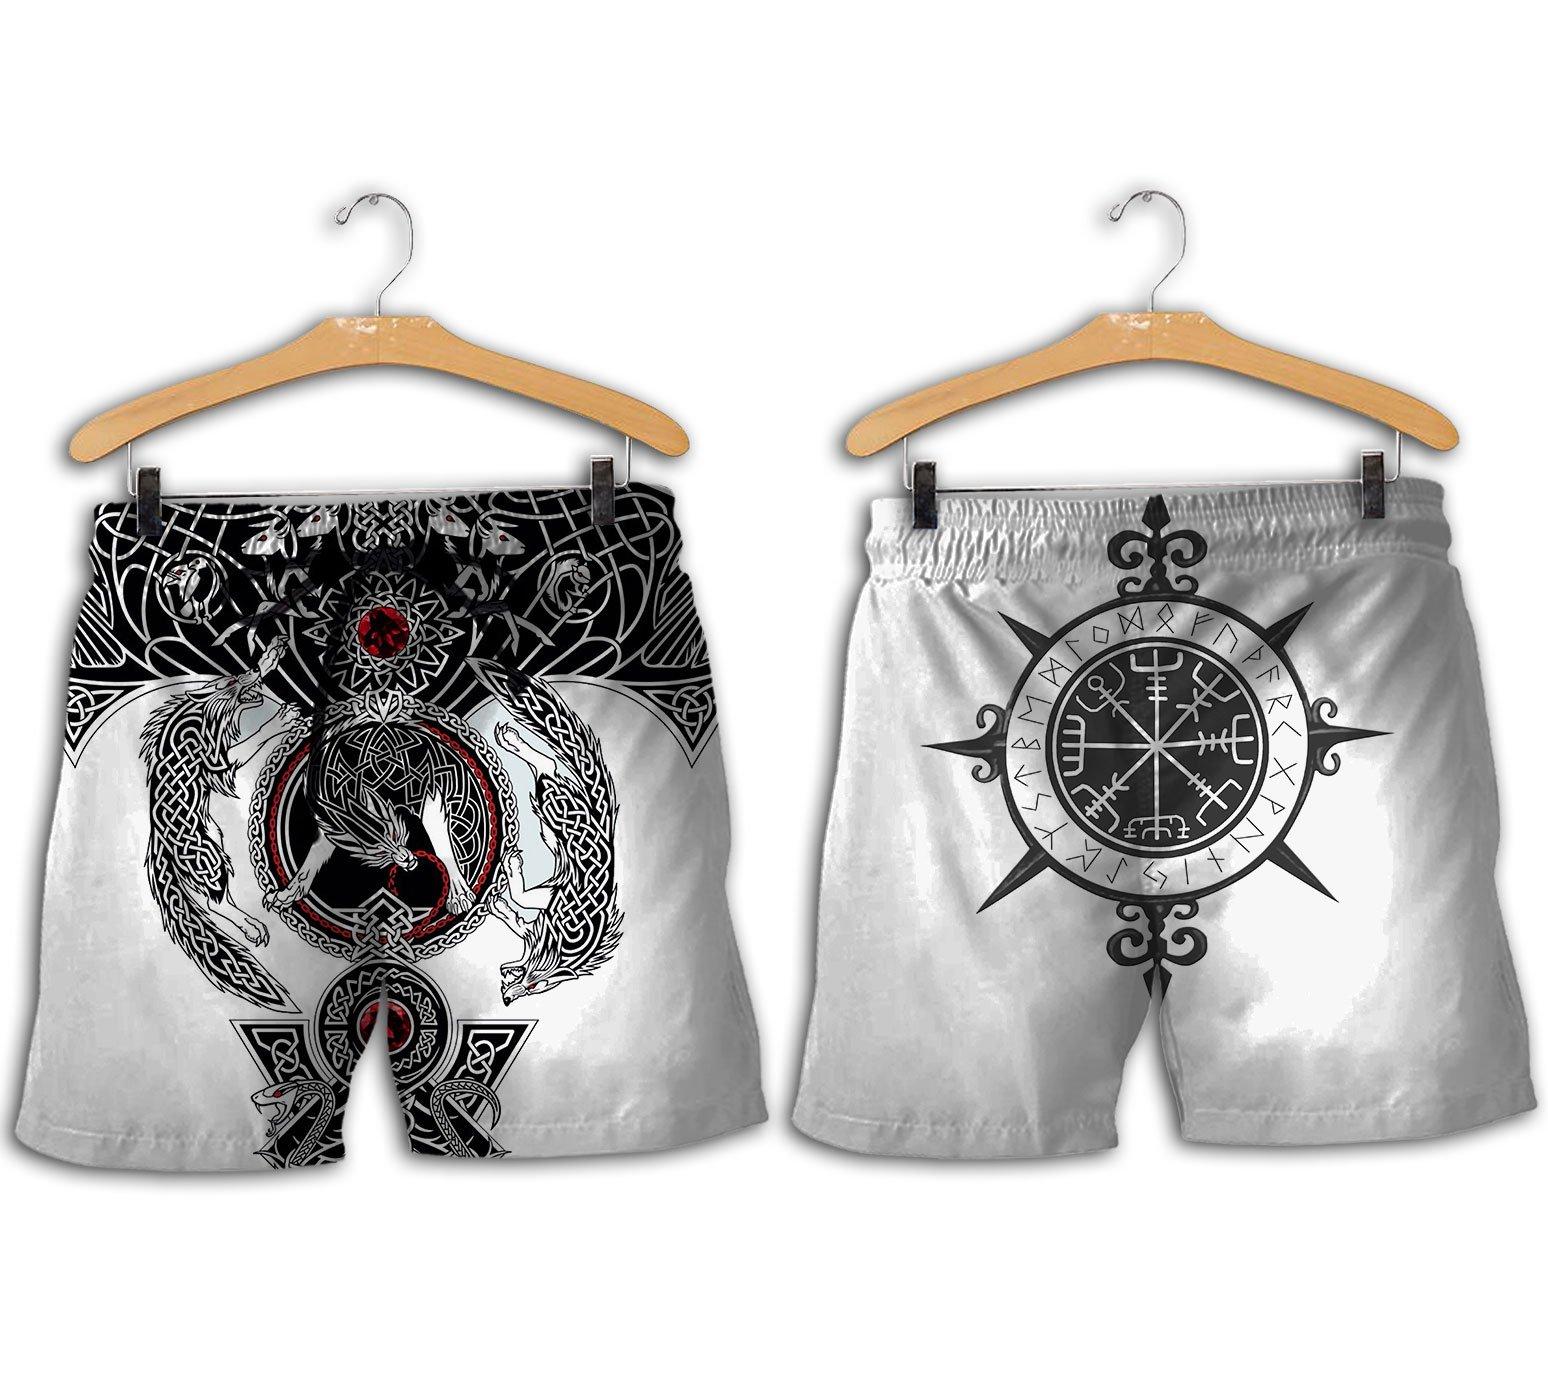 The viking wolf tattoo art 3d full printing shorts